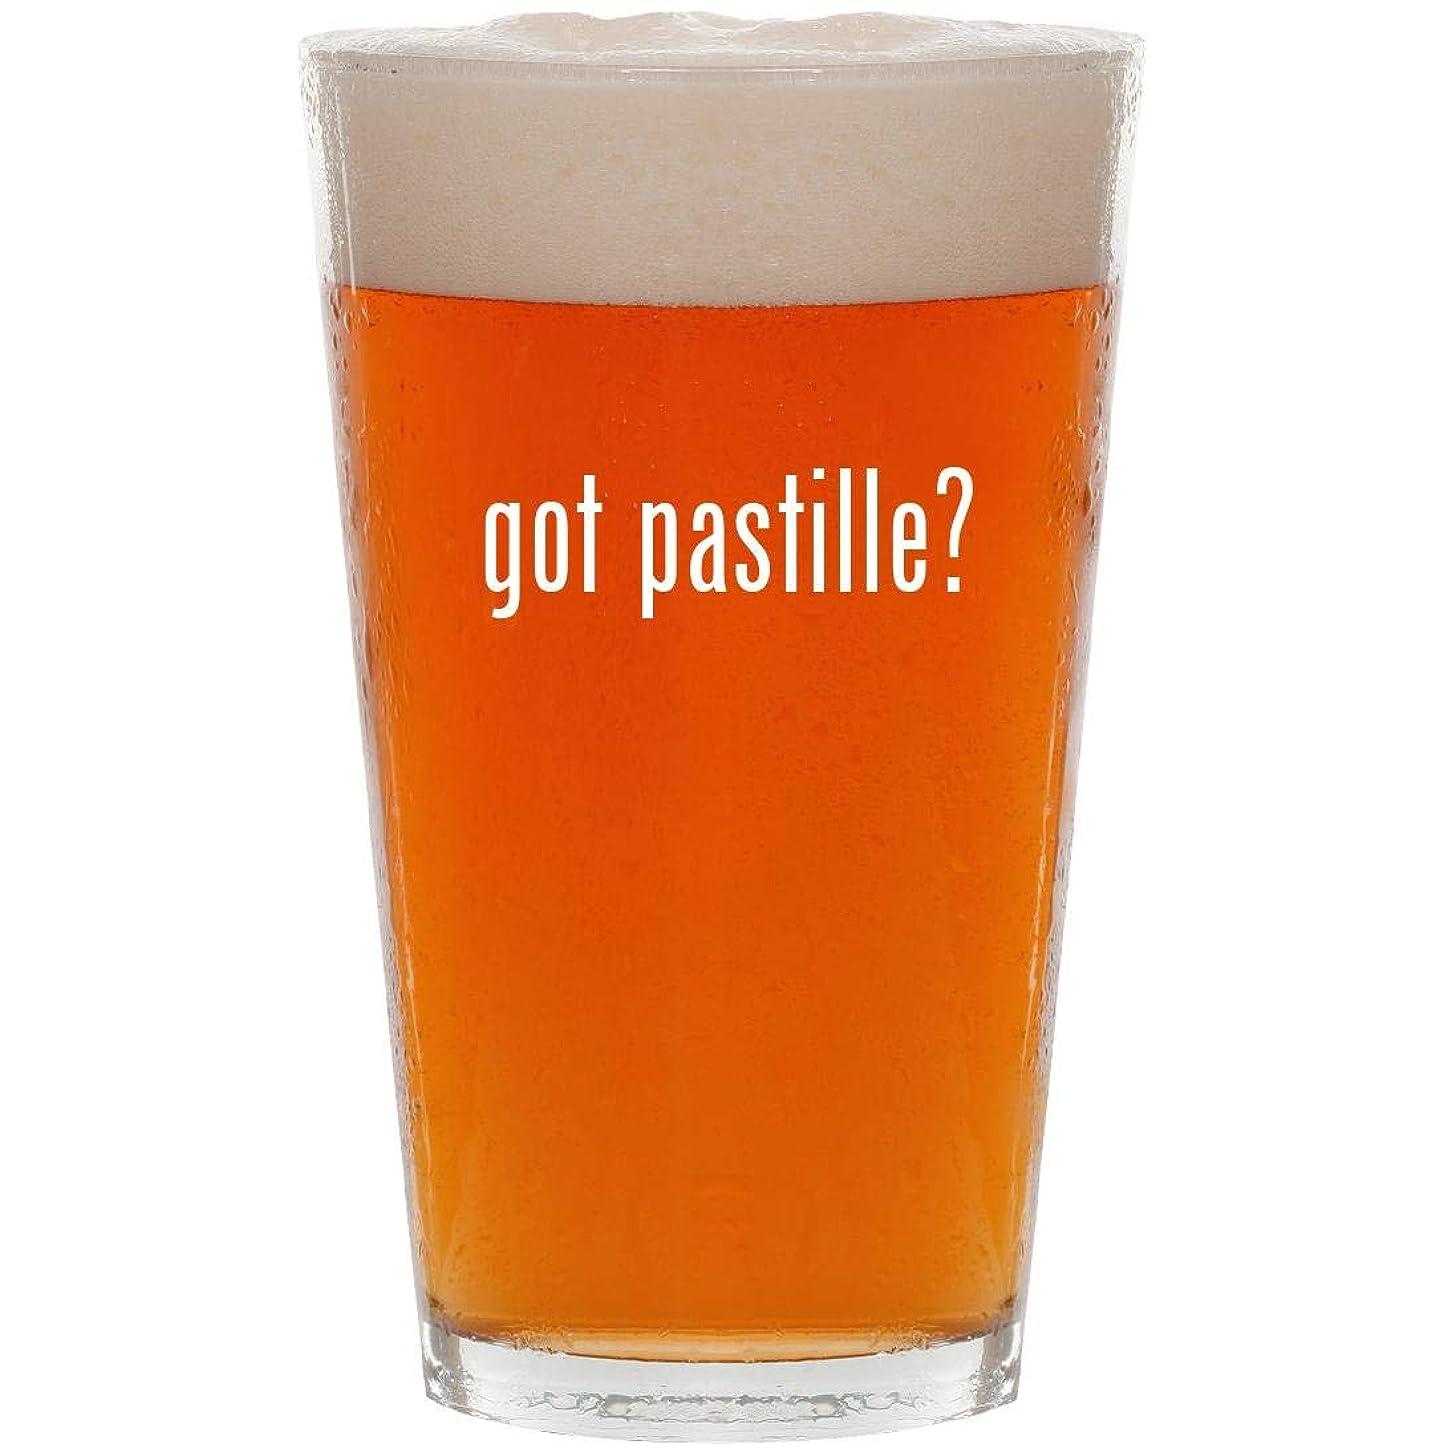 got pastille? - 16oz All Purpose Pint Beer Glass